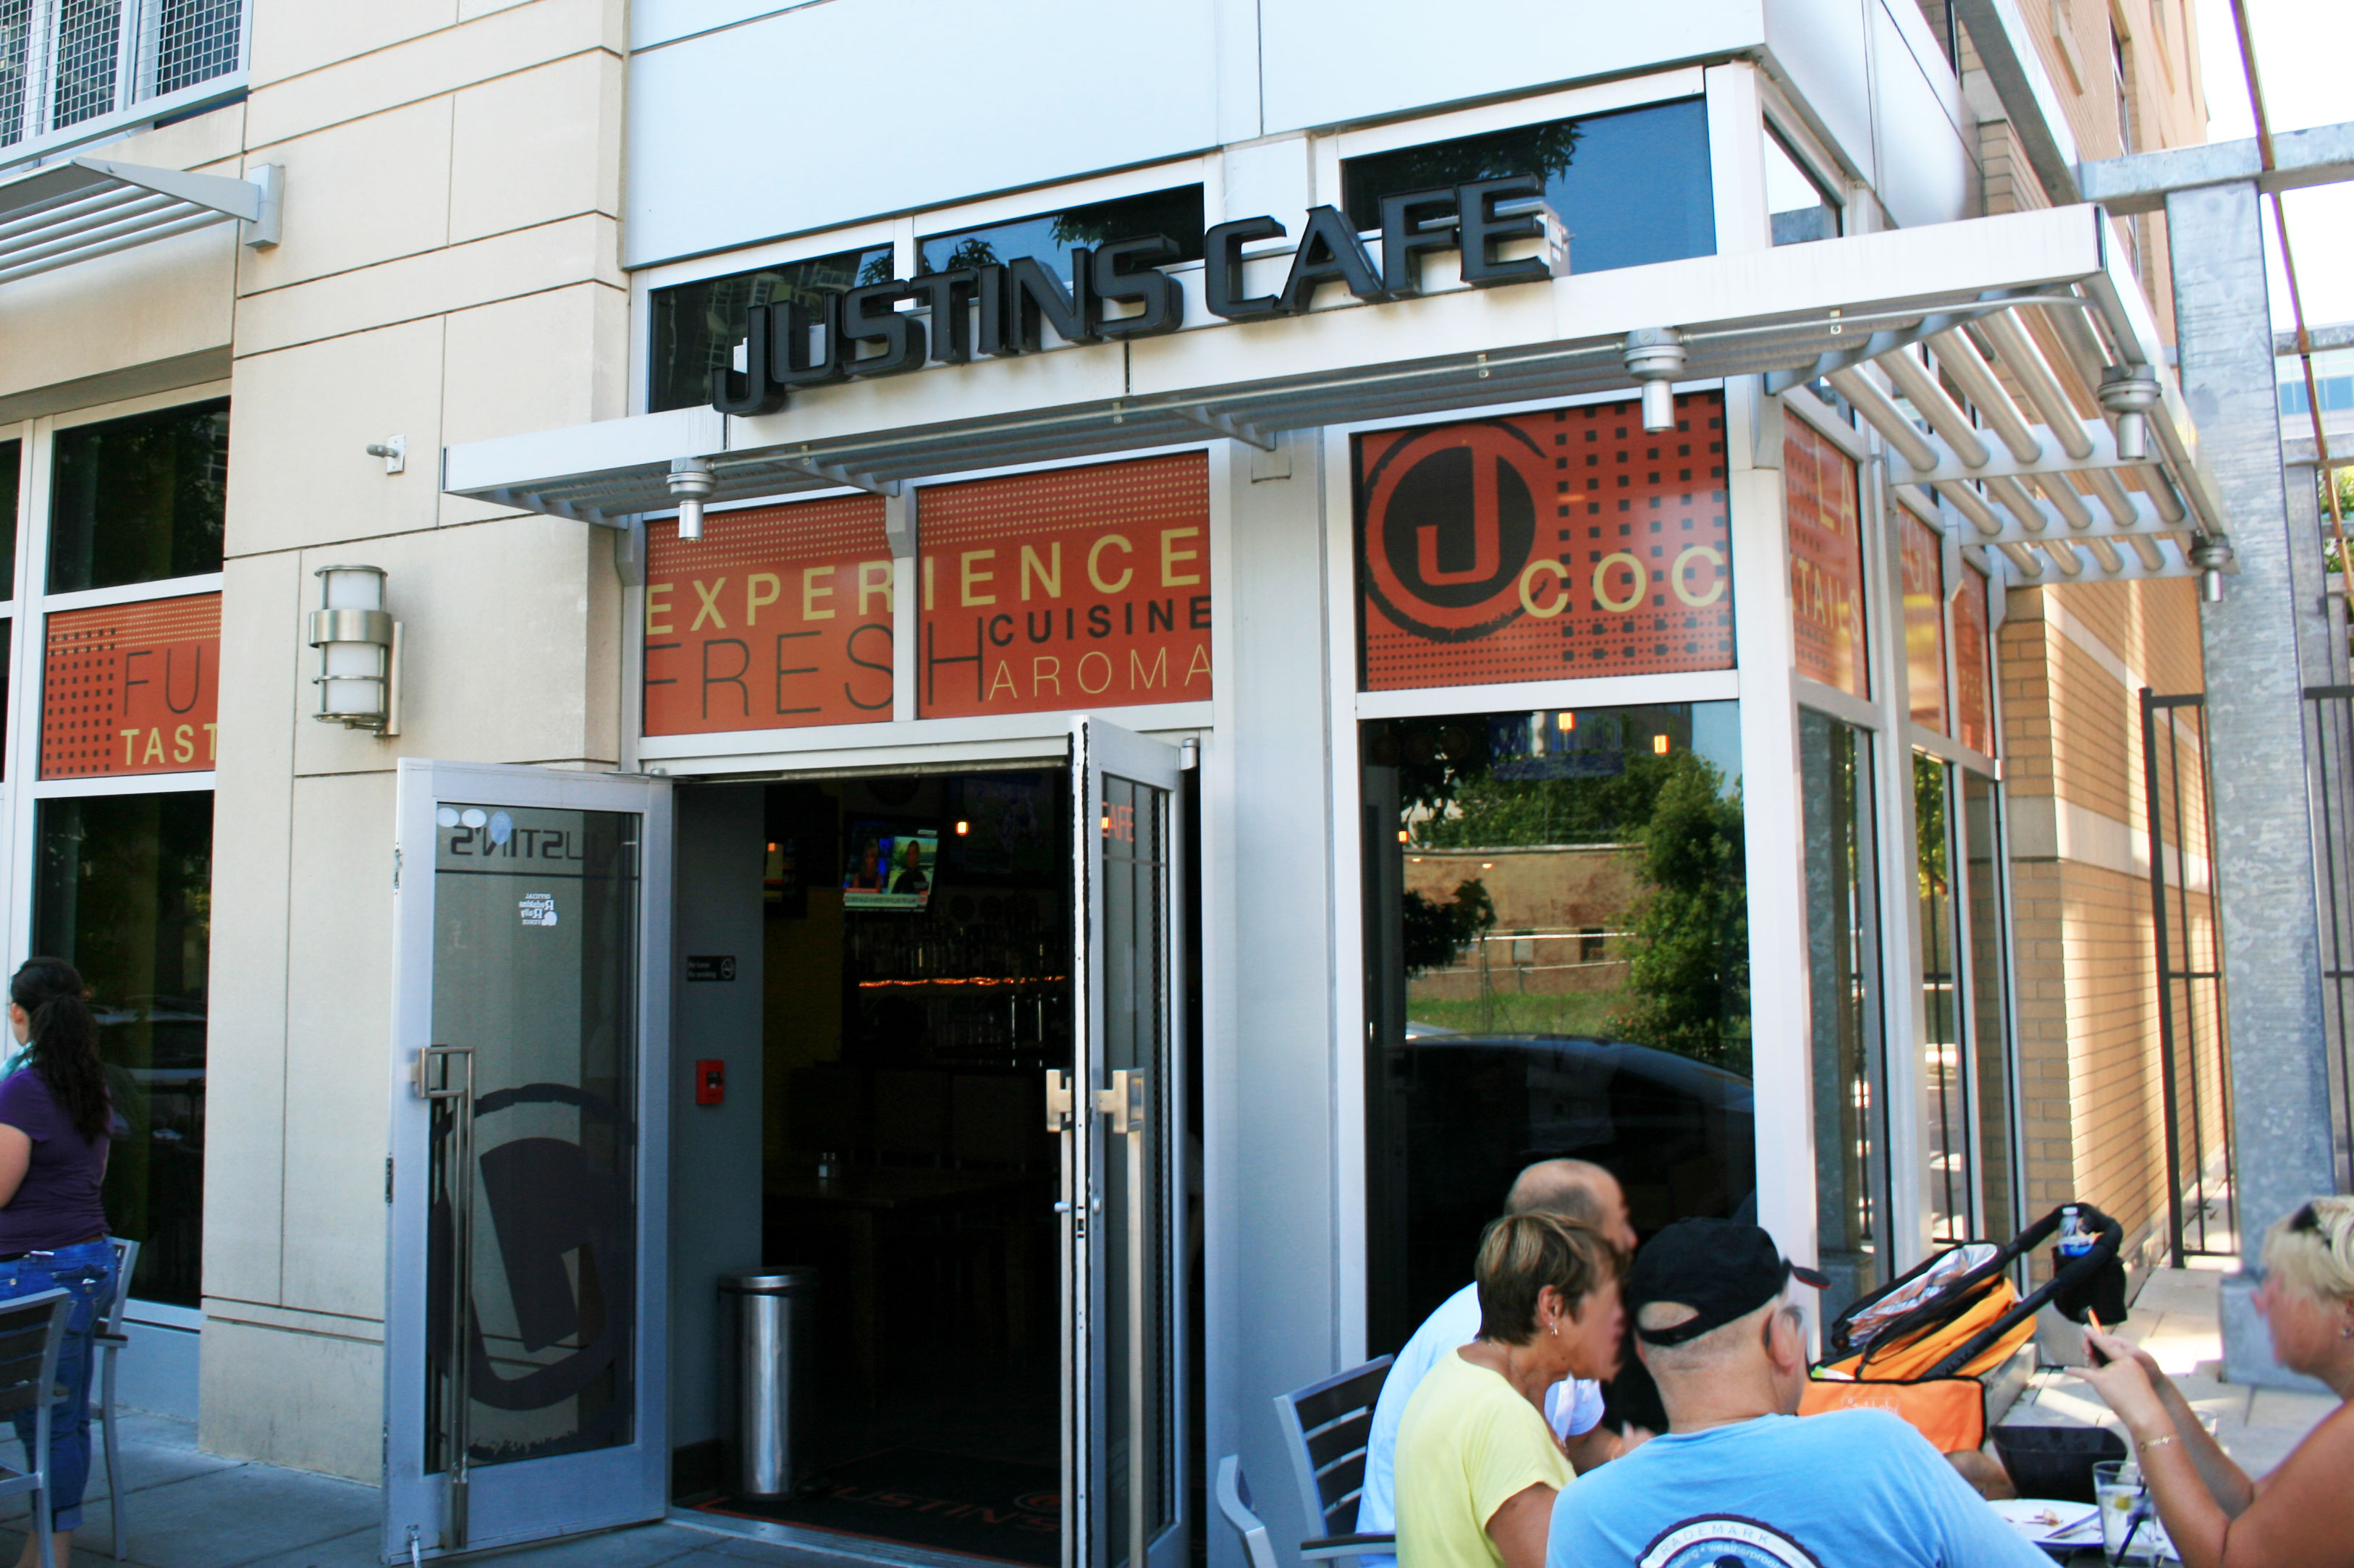 Justin's Cafe